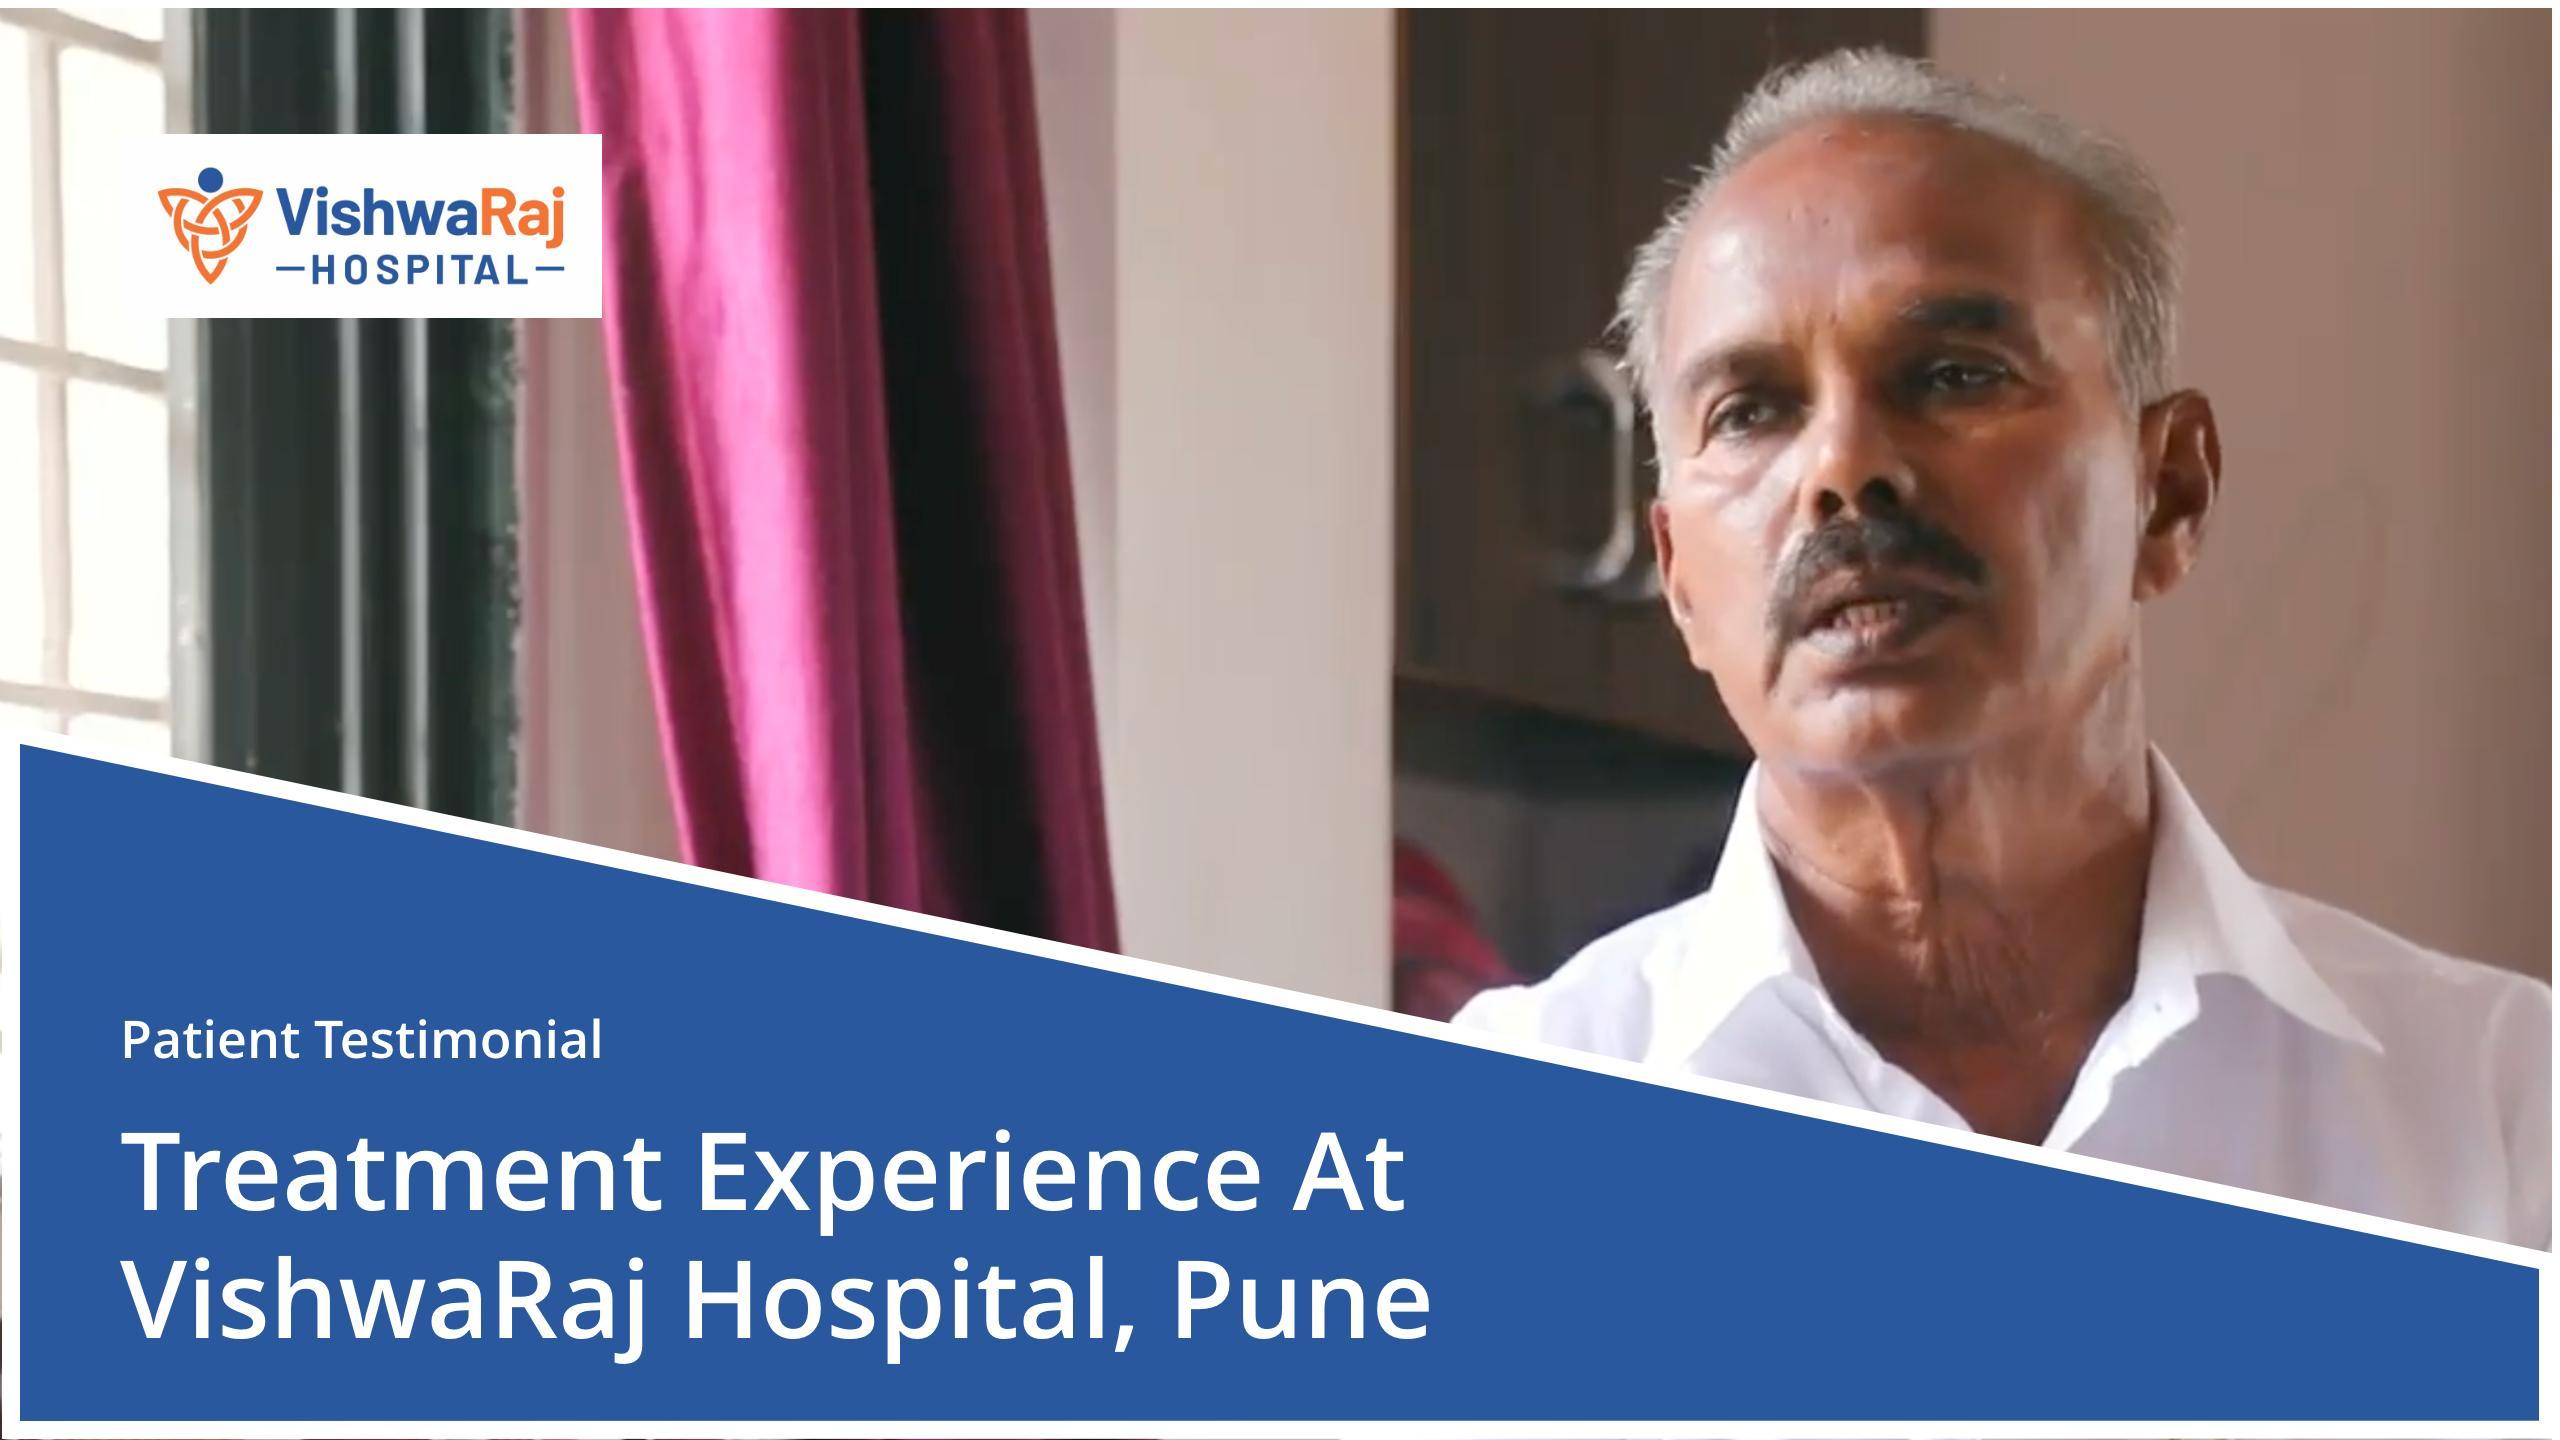 Patient testimonial at VishwaRaj Hospital Pune ortho joint replacement